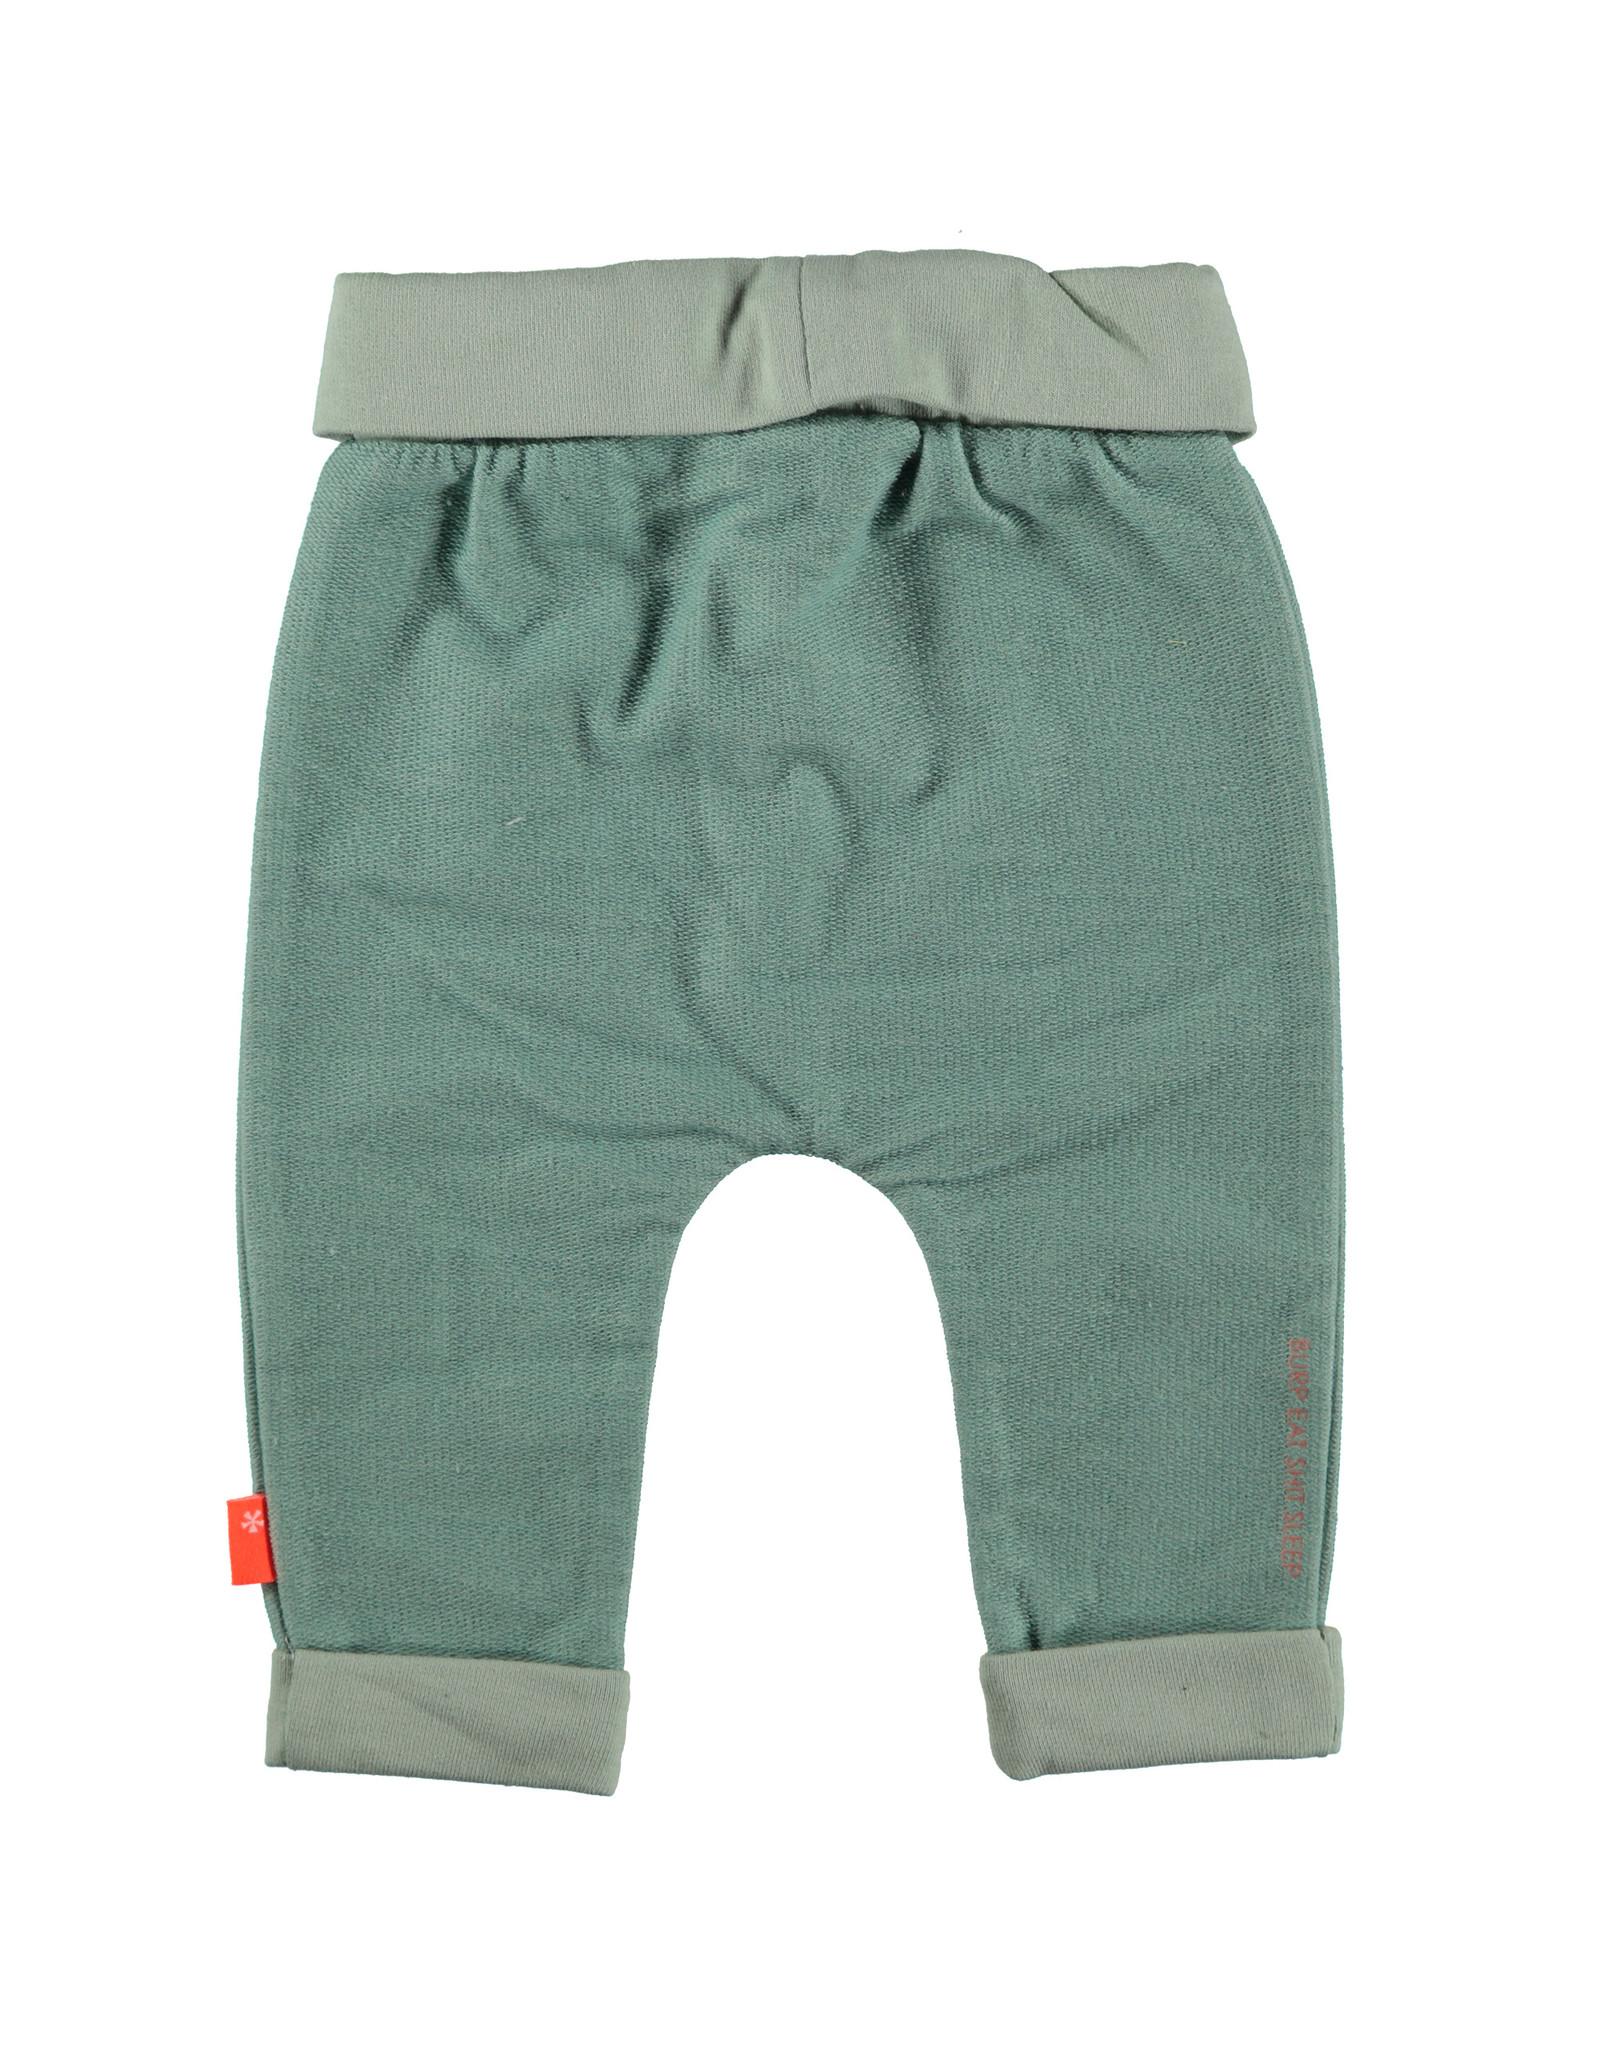 B.E.S.S. Pants Uni, Green